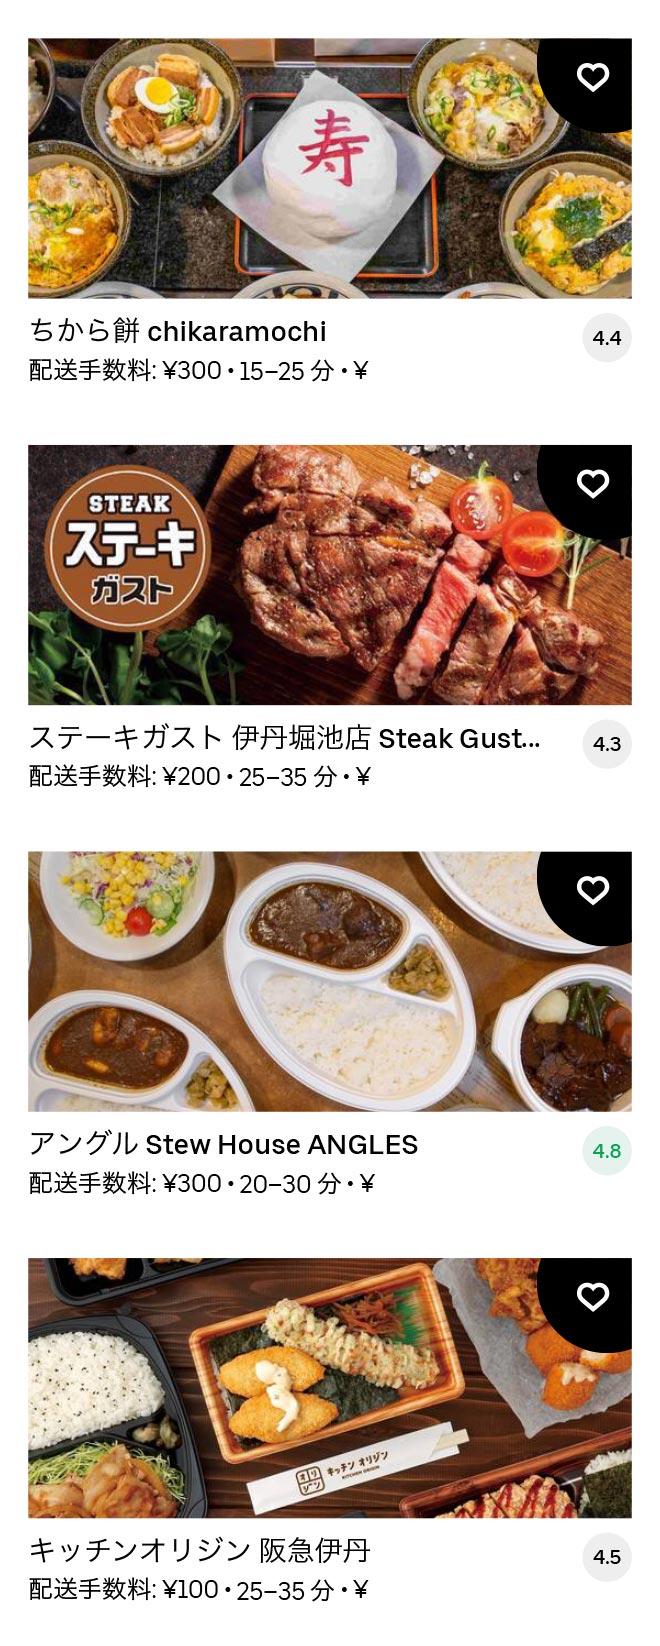 Hankyu itami menu 2011 08